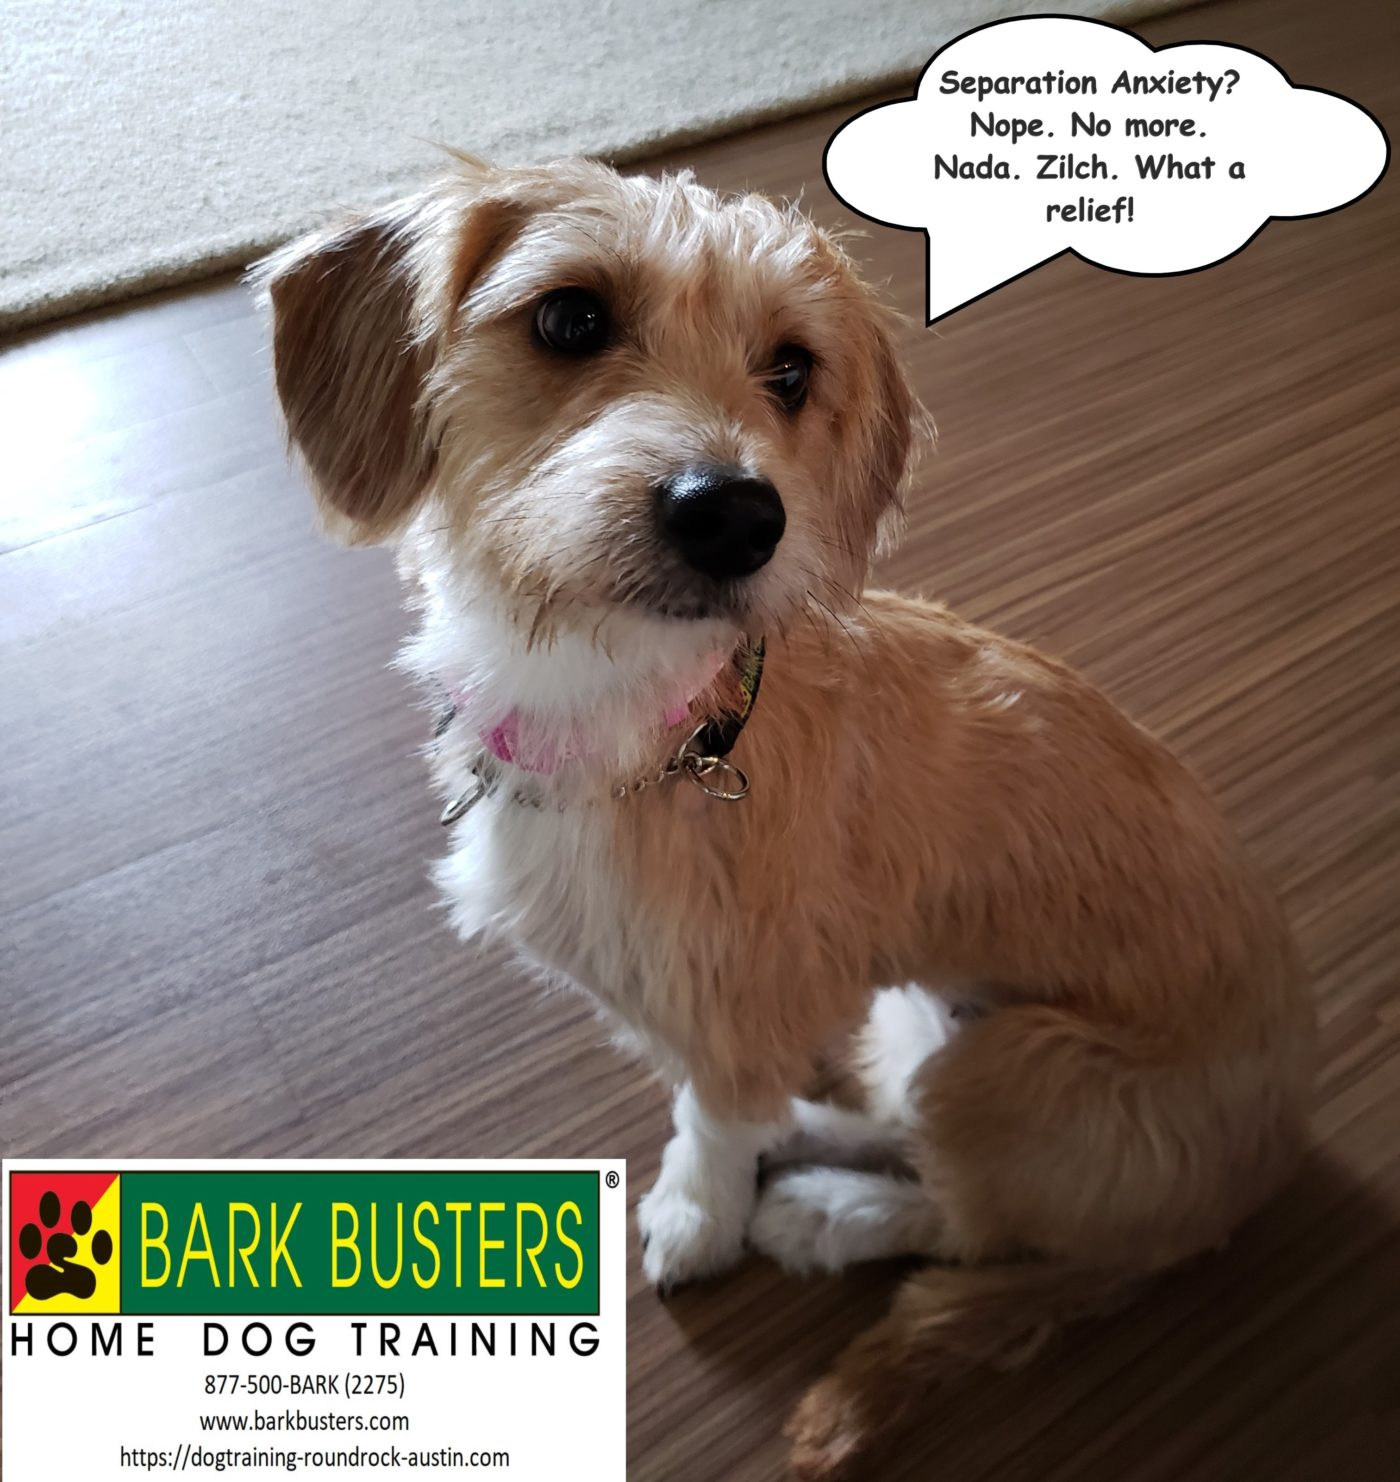 #terriertraining #dogsofbarkbusters #dogtrainingroundrock #dogtrainingeastaustin #separationanxiety #speakingdog